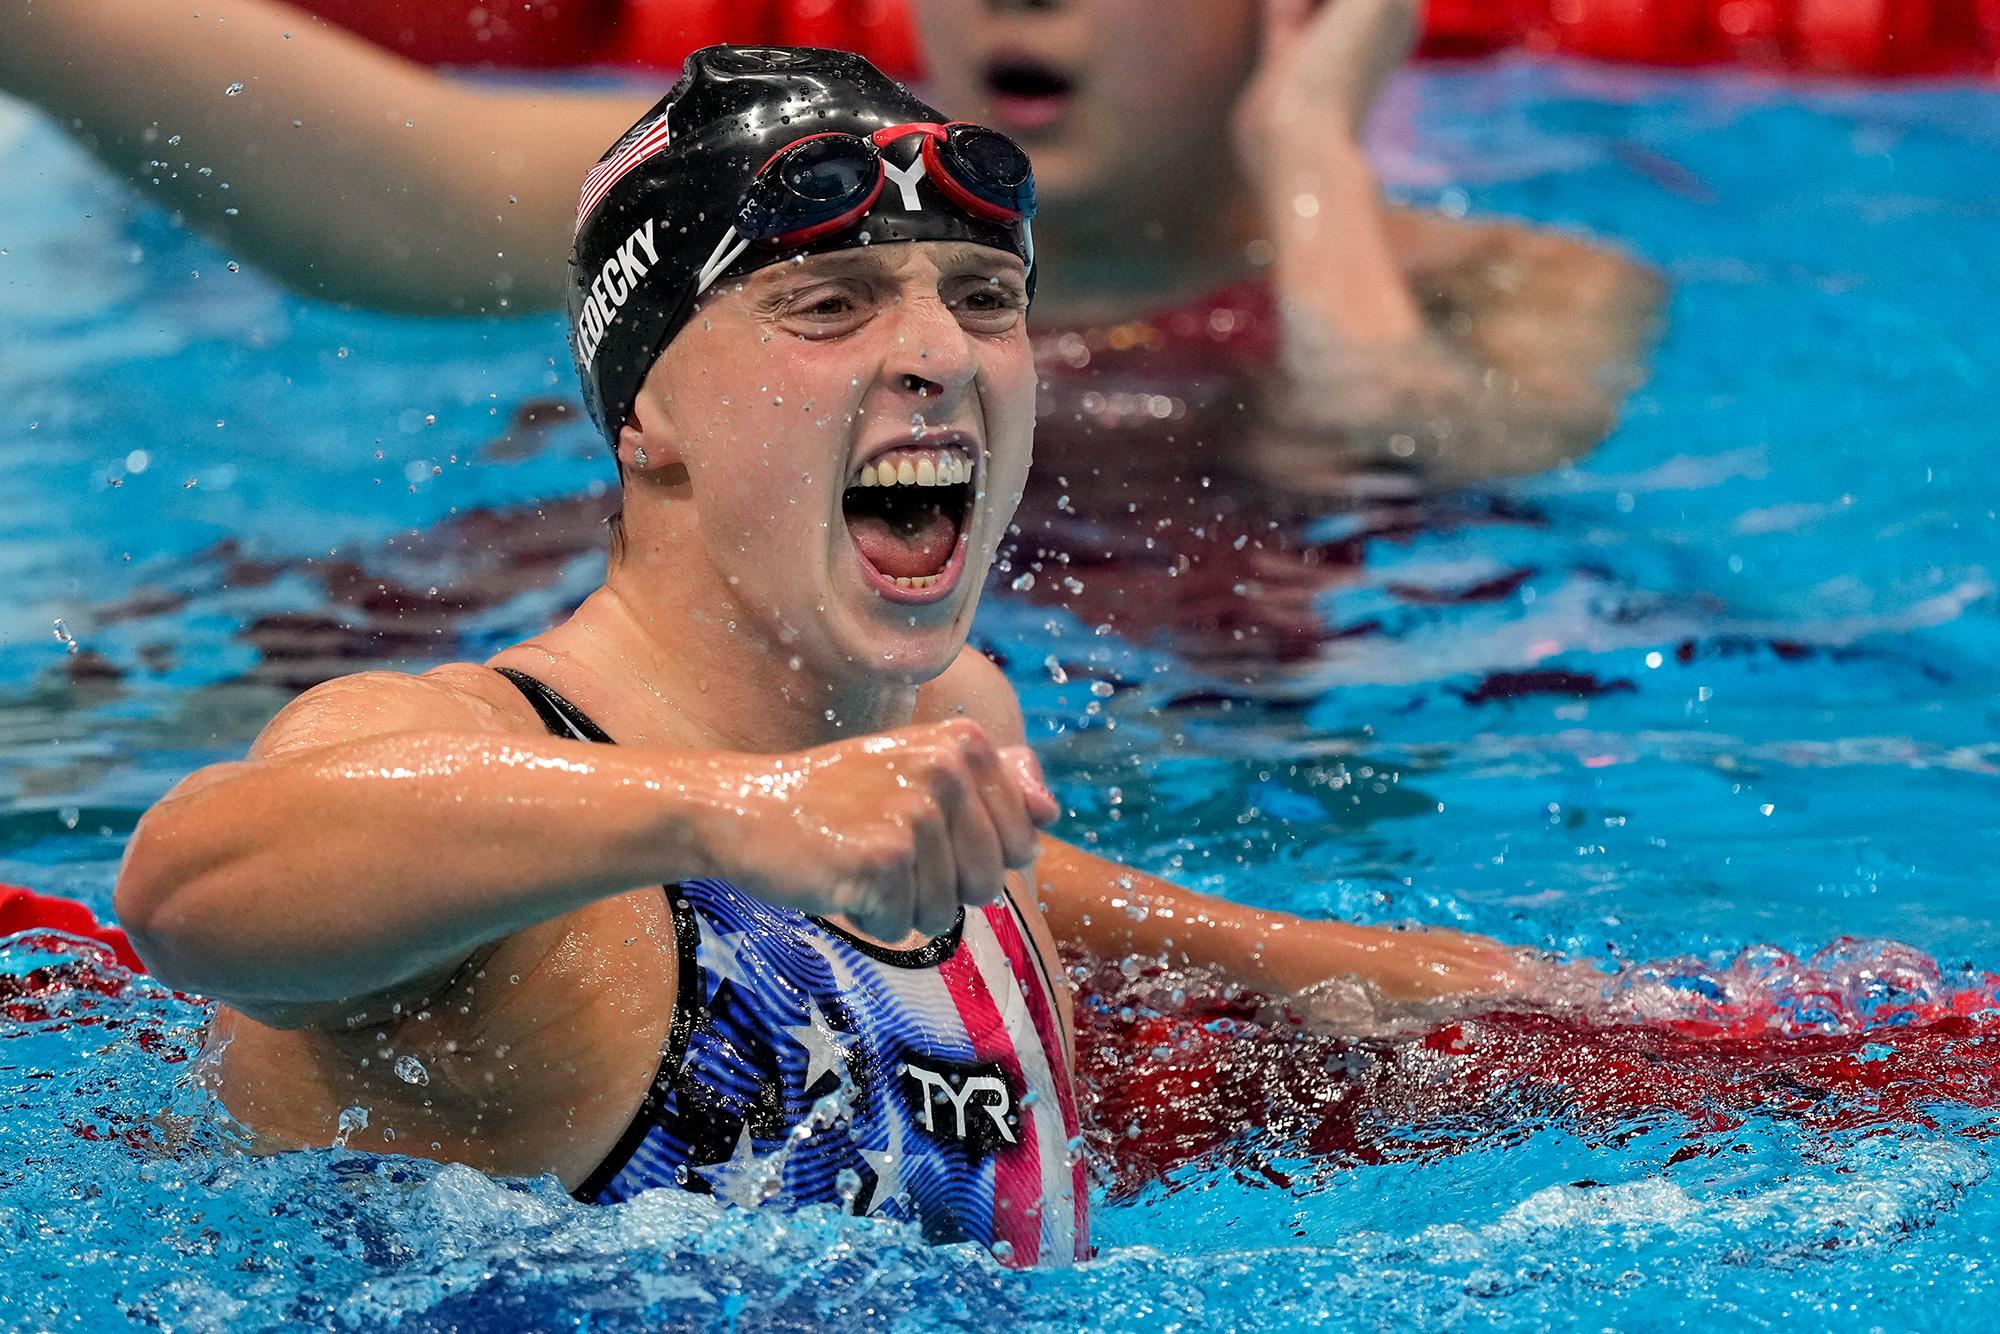 katie-ledecky-wins-women-s-1500m-freestyle-in-dominant-fashion